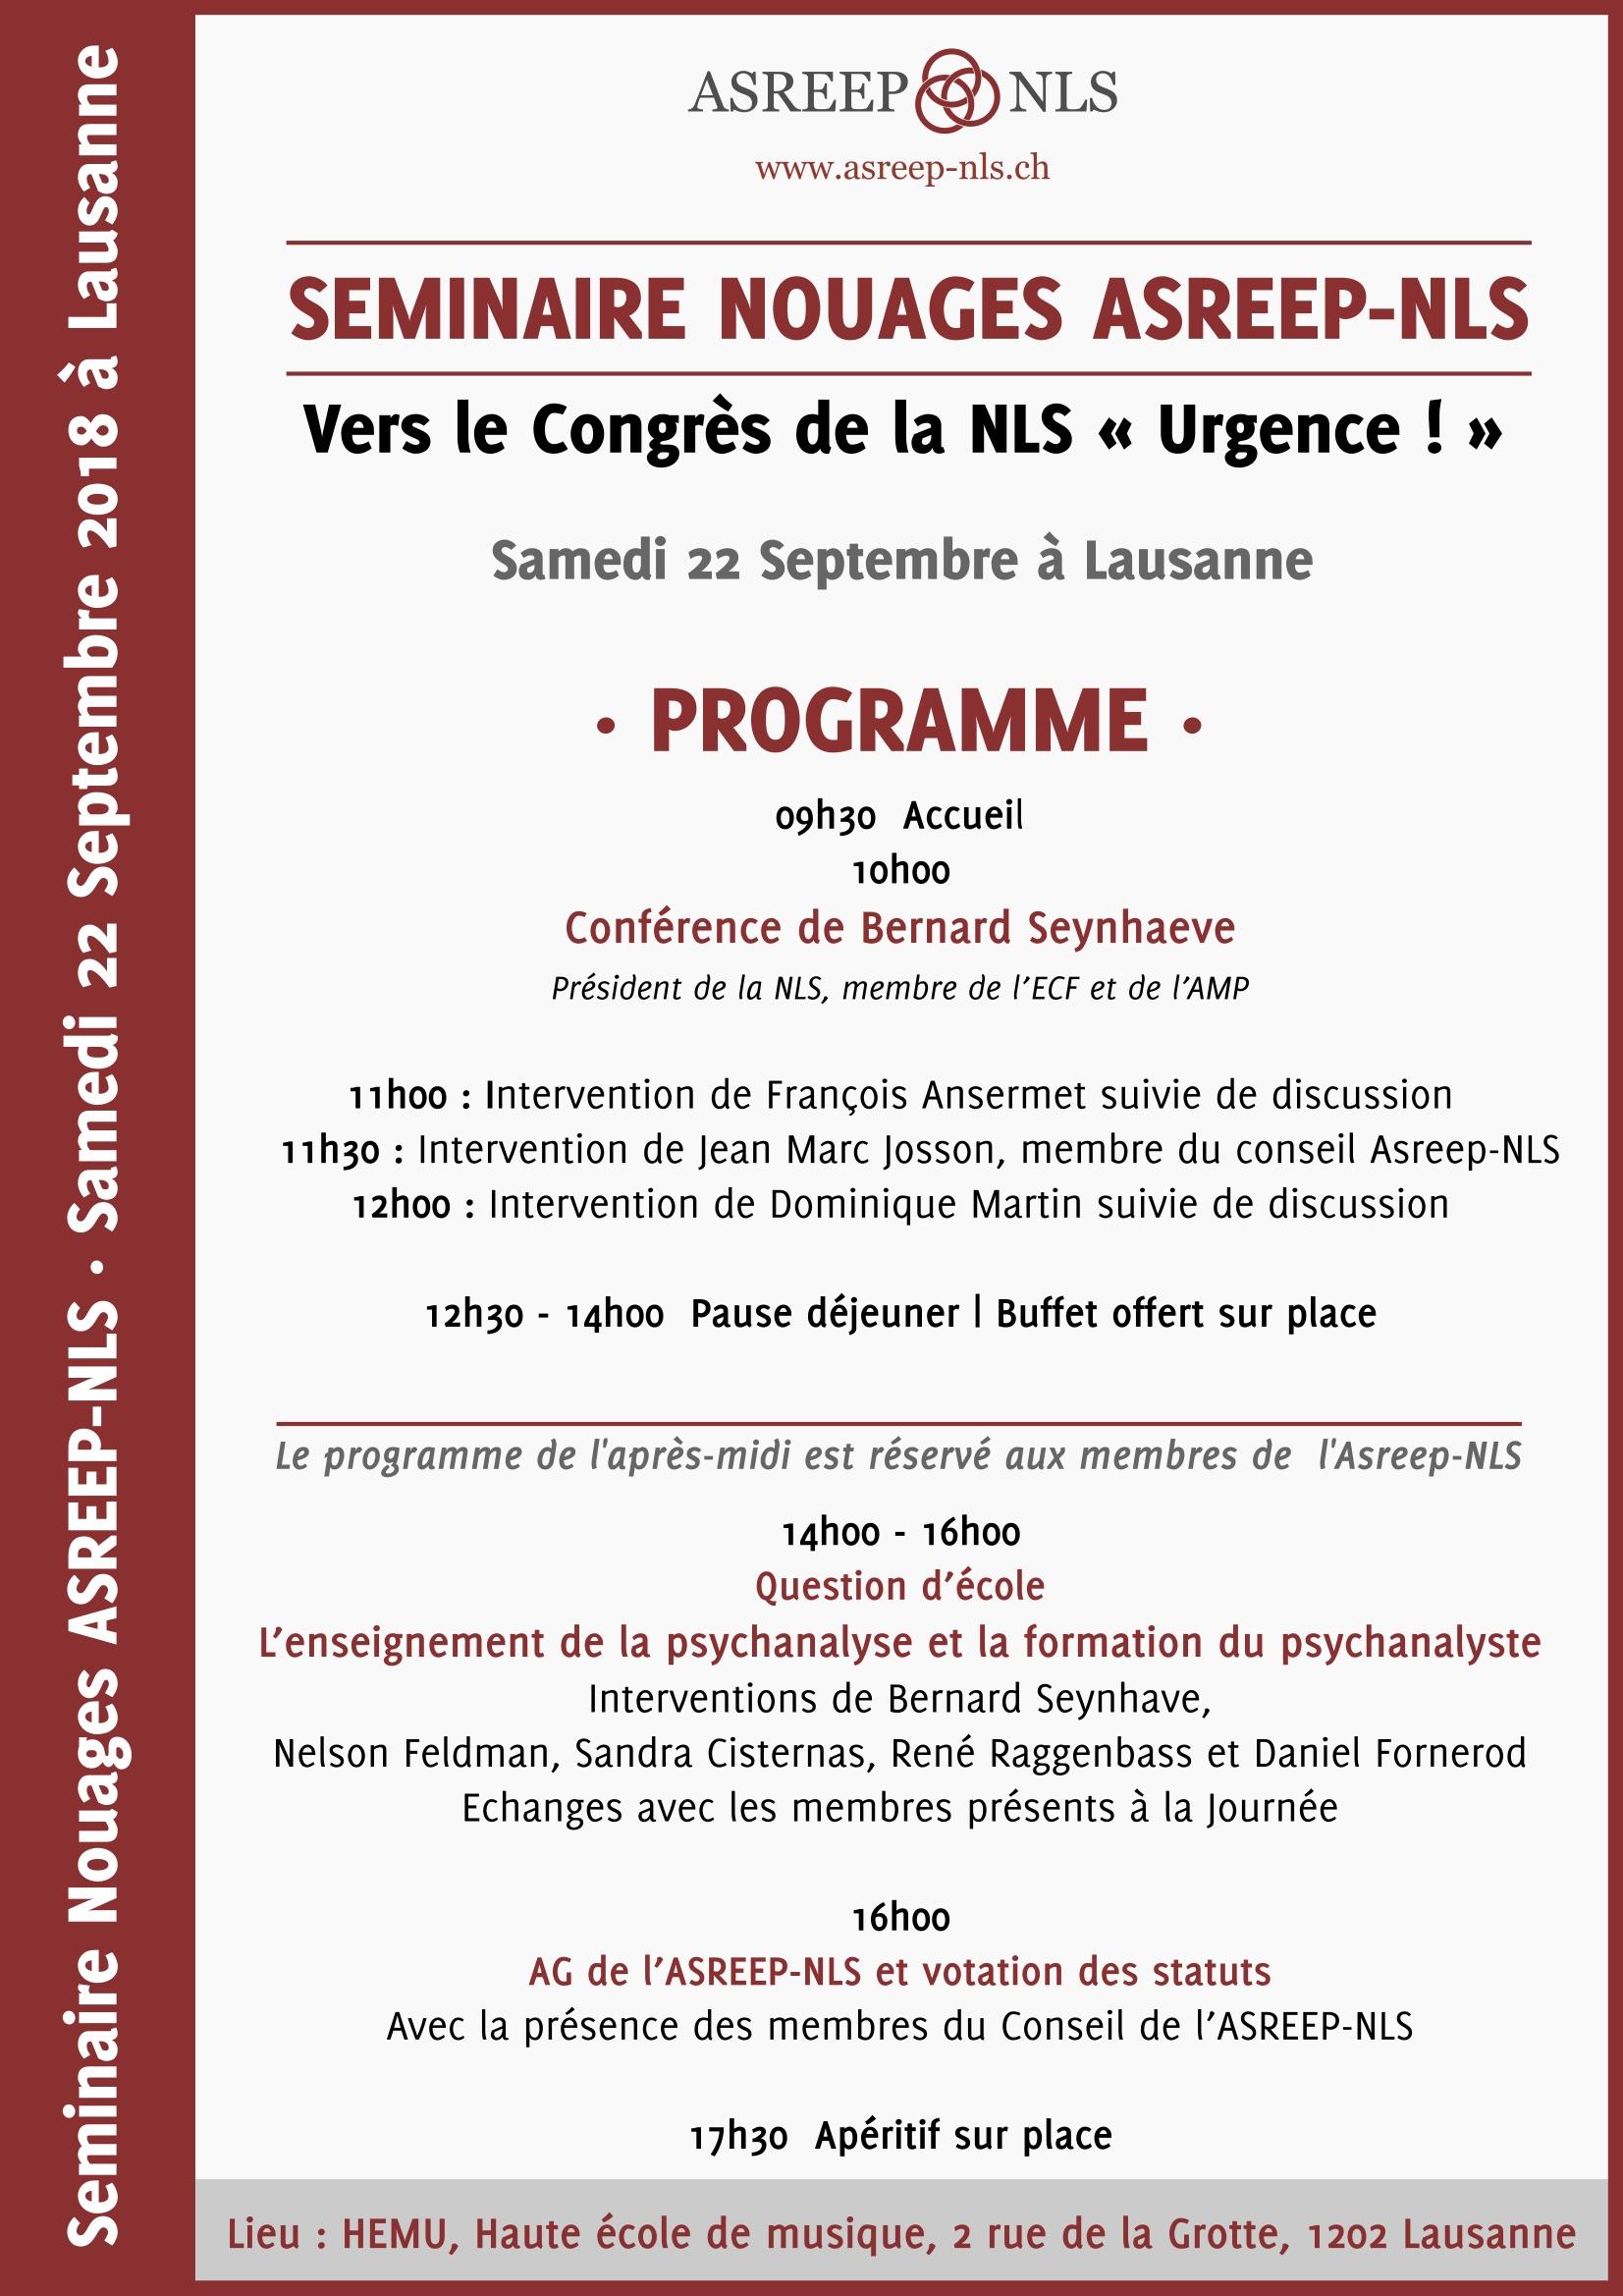 http://www.asreep-nls.ch/seminaire-nouages-asreep-nls-vers-le-congres-de-la-nls-urgence/